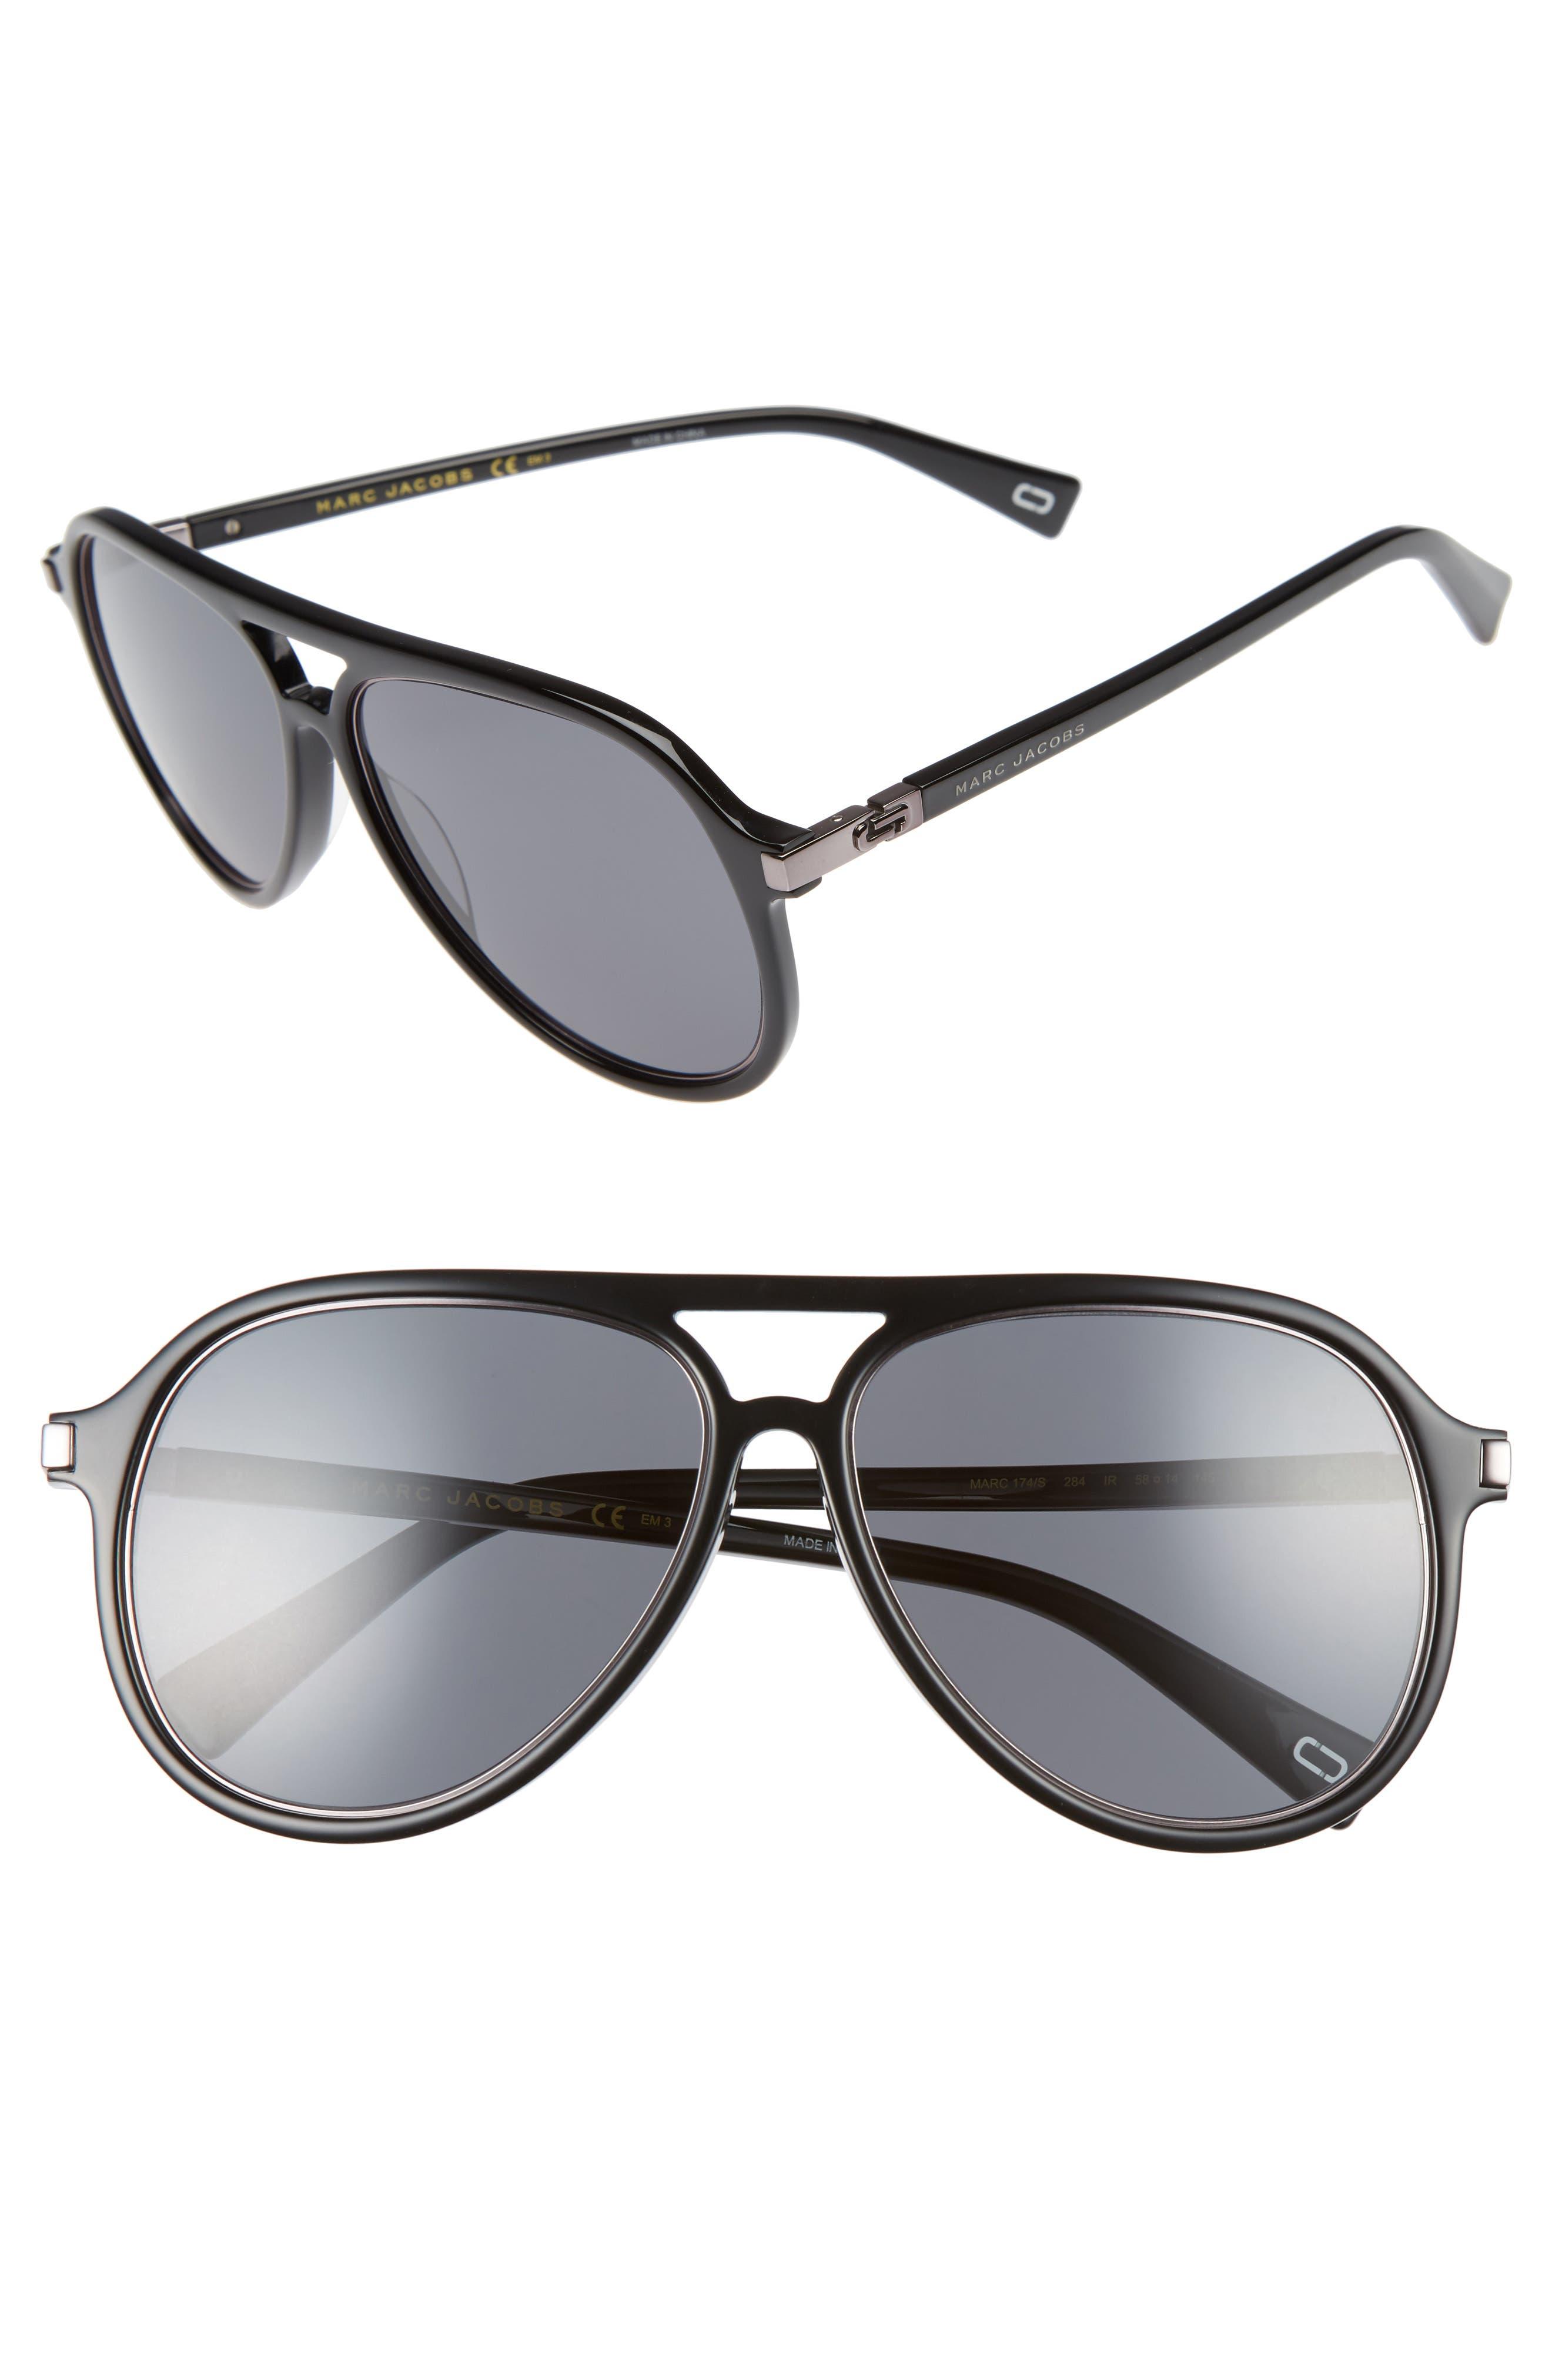 Main Image - MARC JACOBS 58mm Navigator Sunglasses